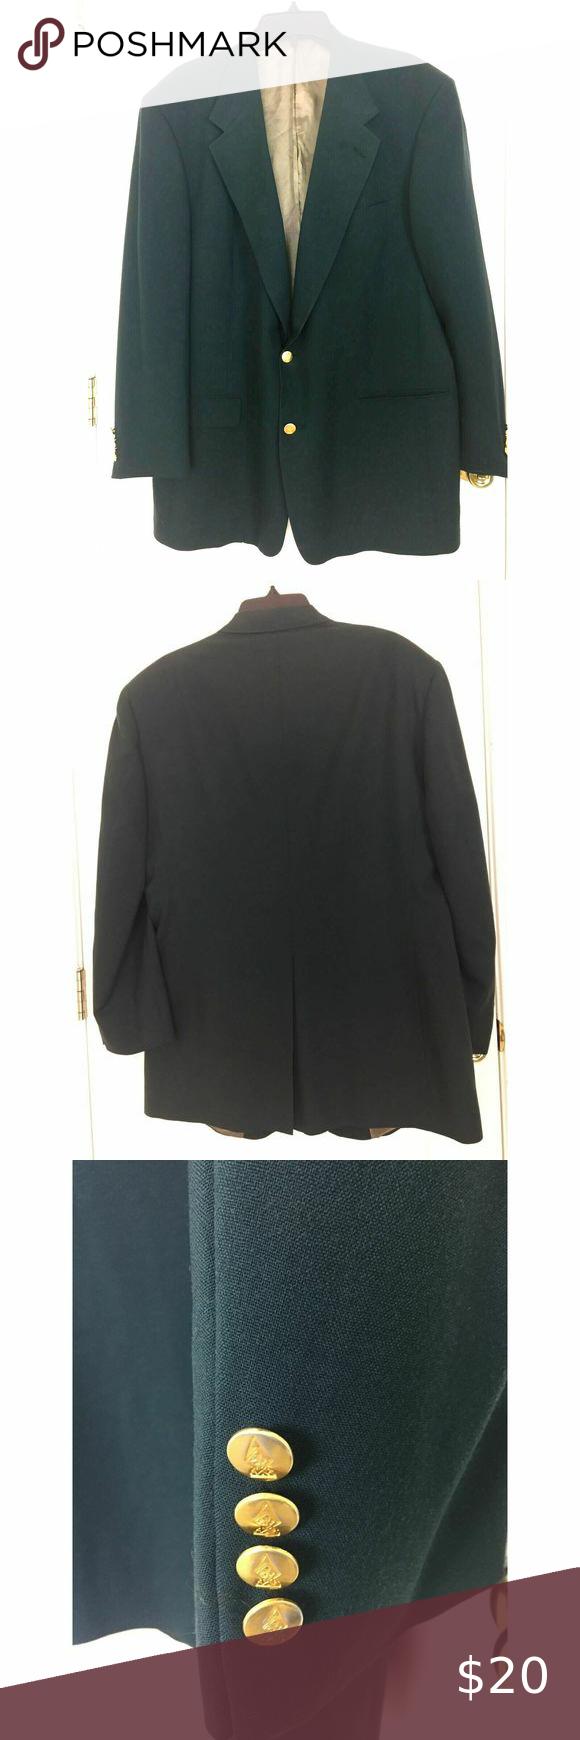 Austin Reed Men S Blazer Coat Jacket Usa 44 L Vtg In 2020 Blazer Coat Blazer Clothes Design